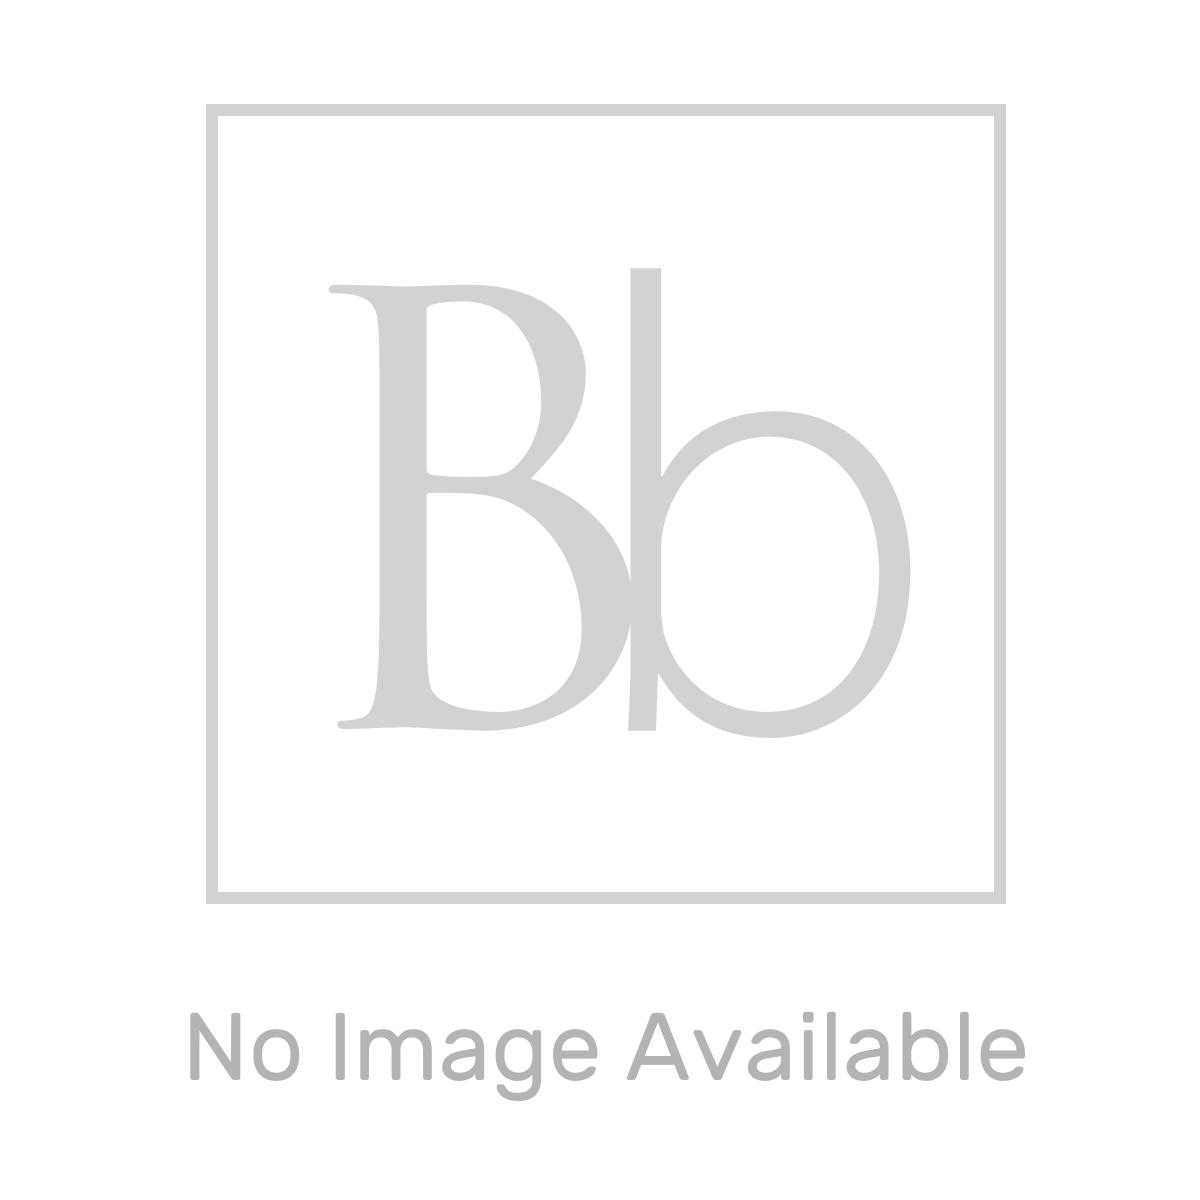 Aquadart Grey Slate Shower Tray 1700 x 800 Lifestyle